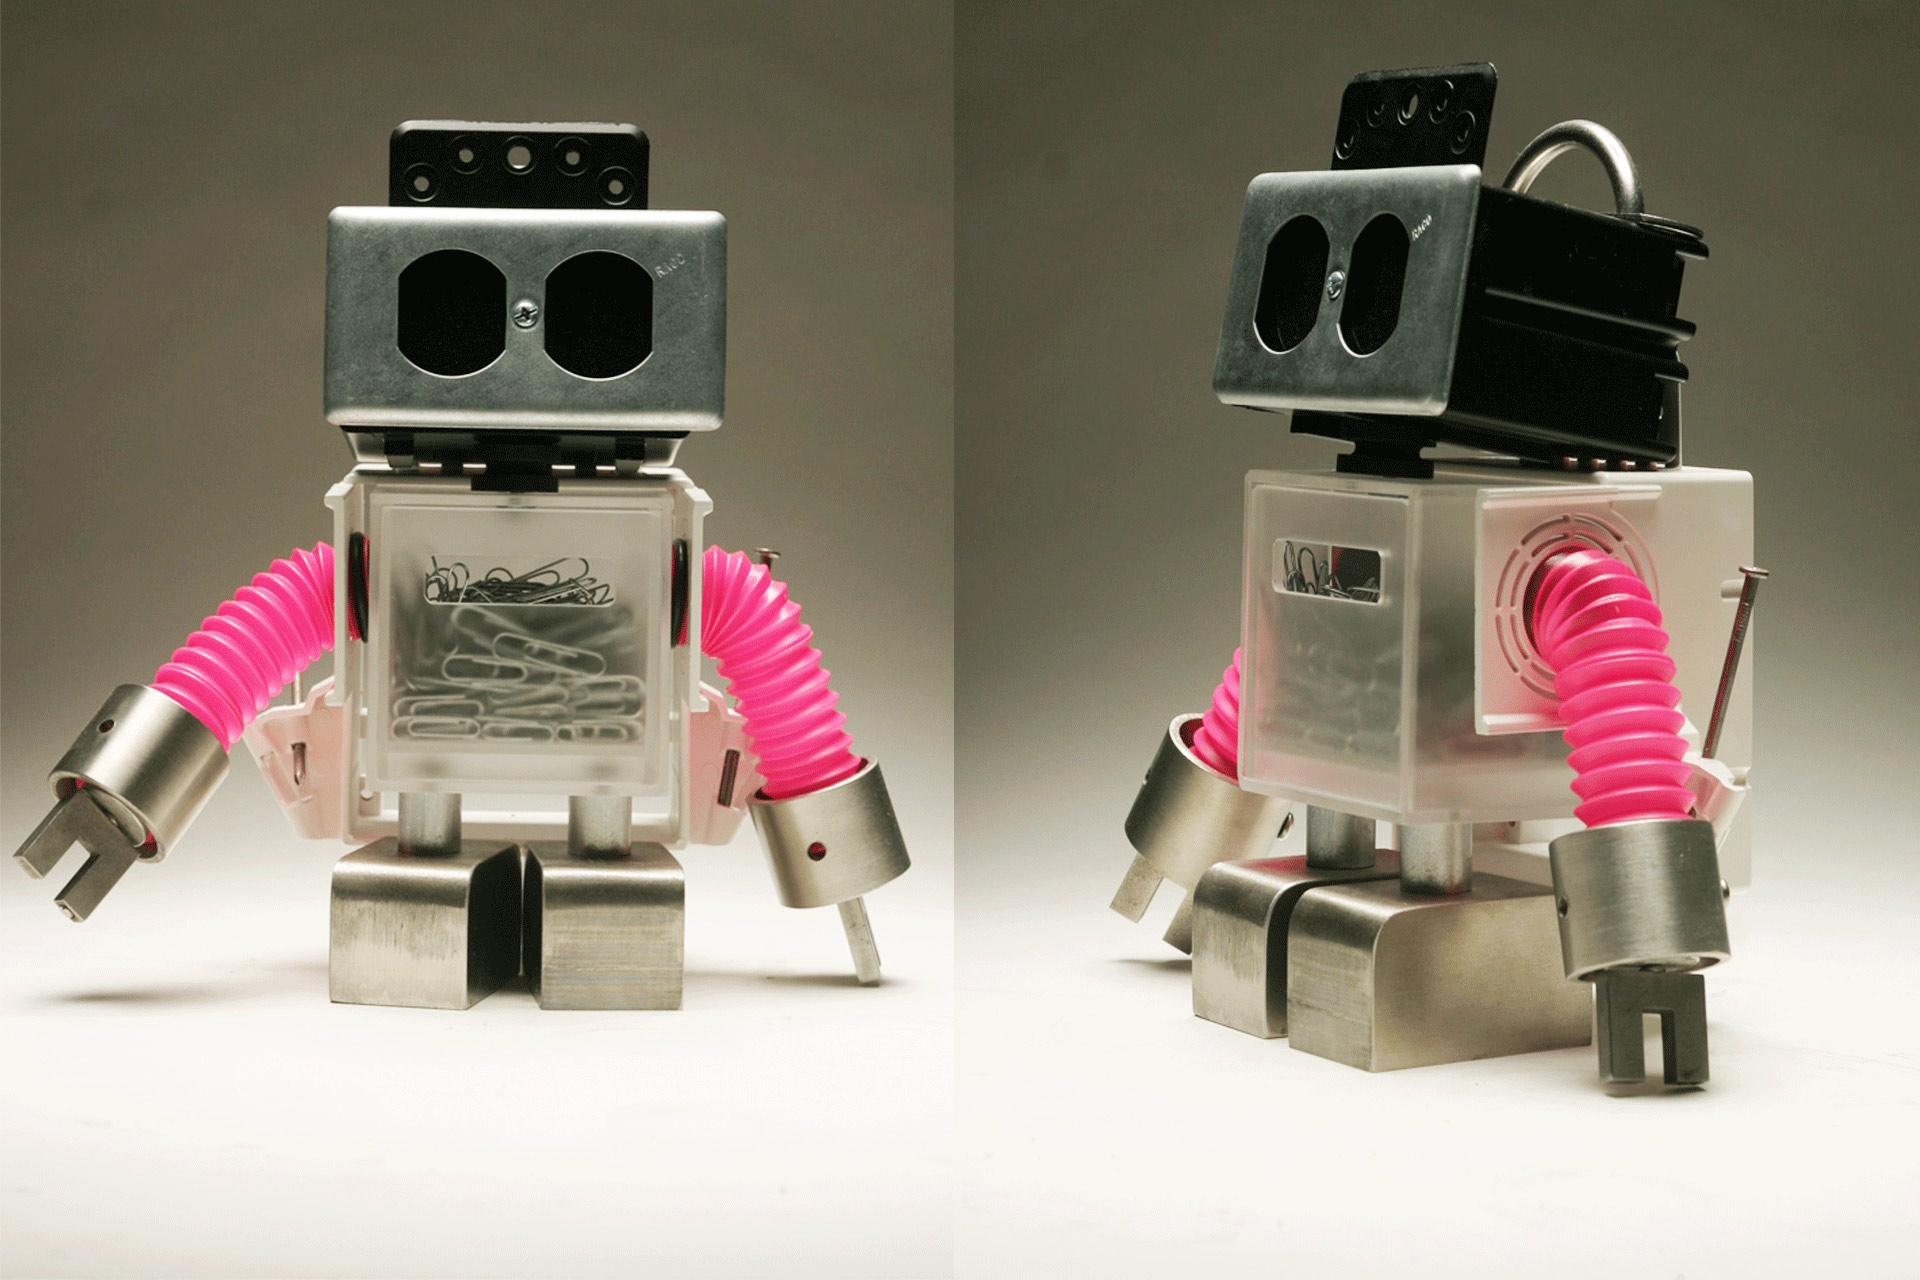 bots2